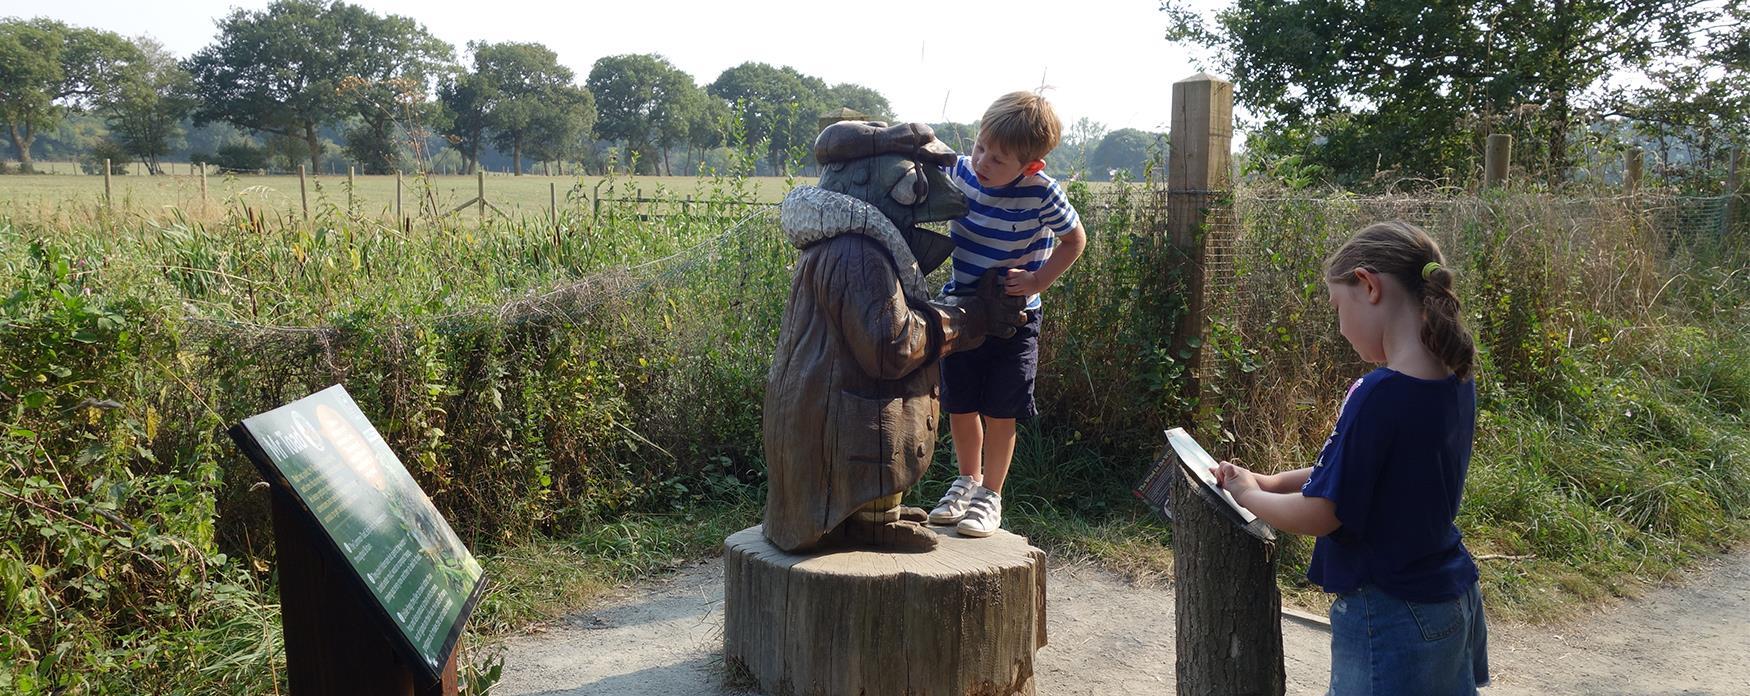 A family exploring Hanningfield Reservoir